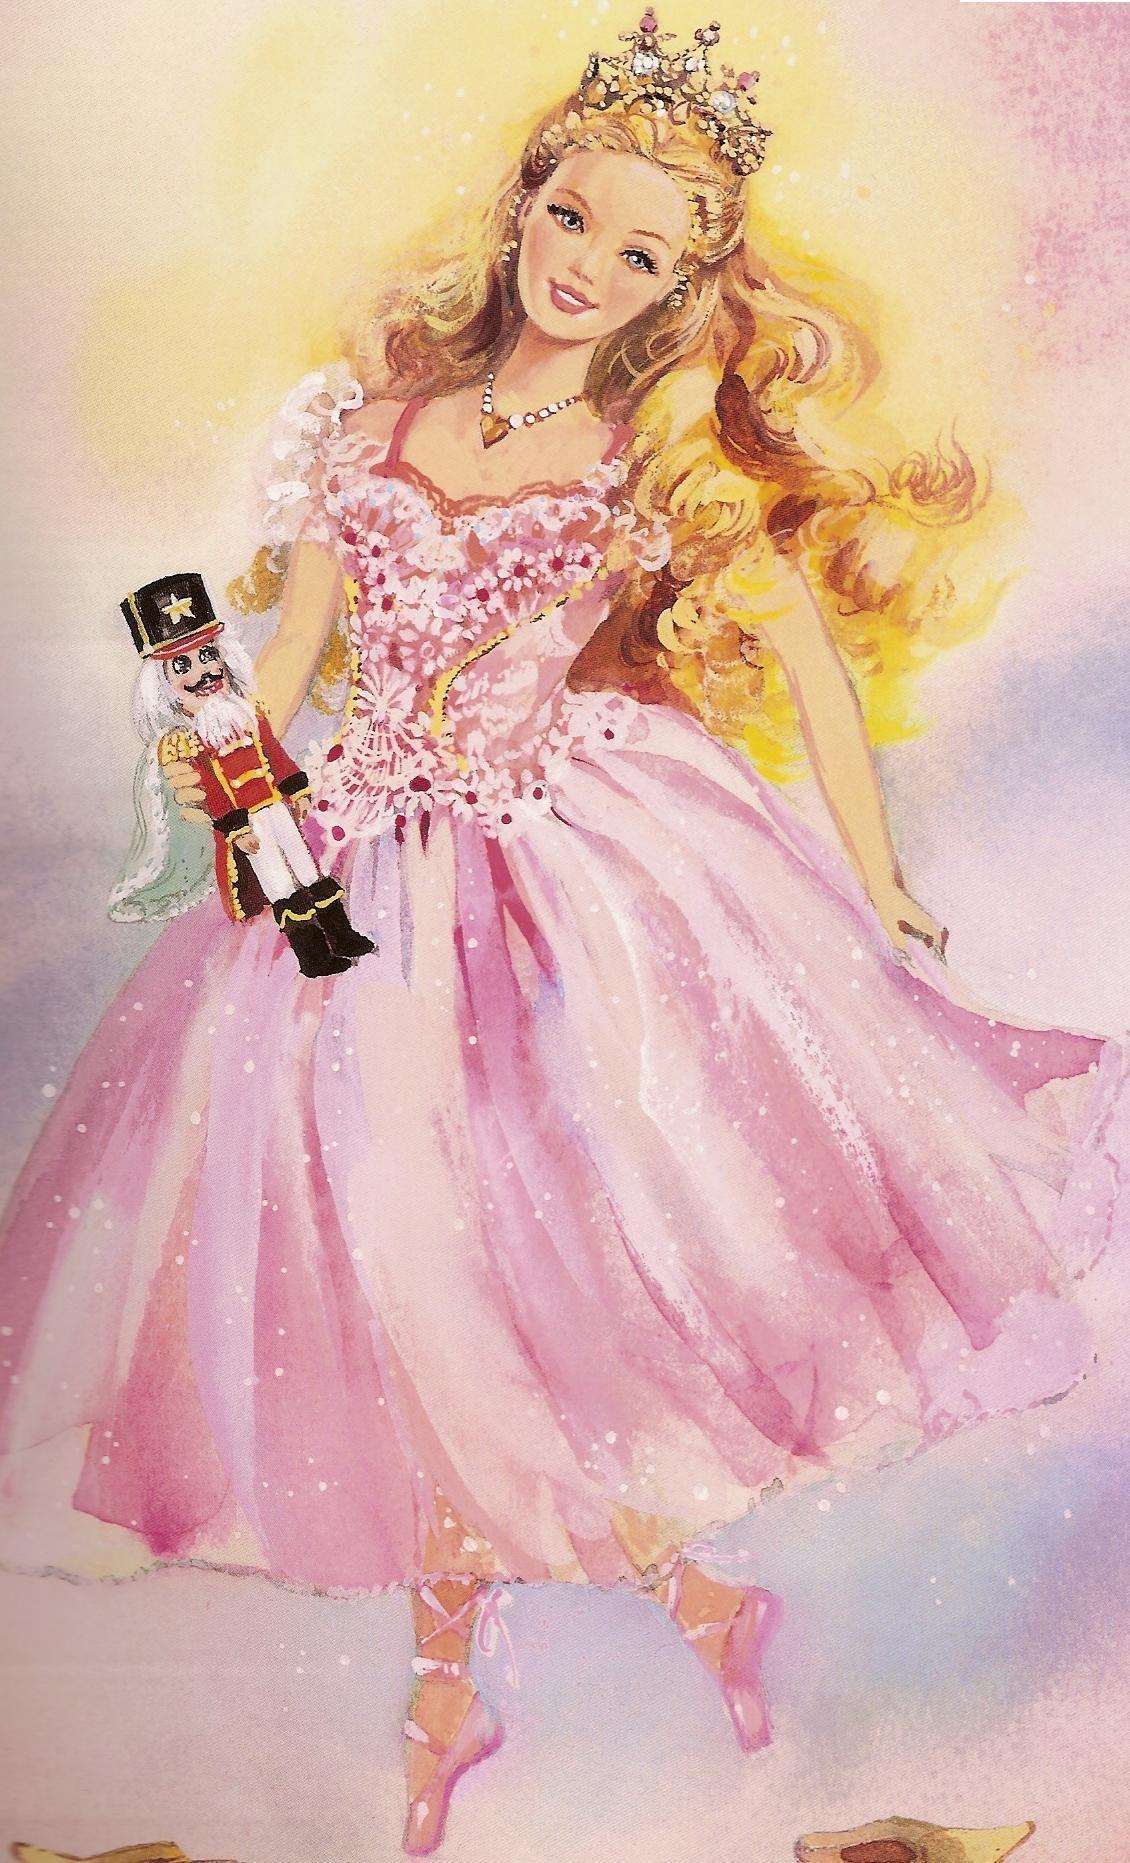 Barbie in the nutcrackergallery films voltagebd Image collections